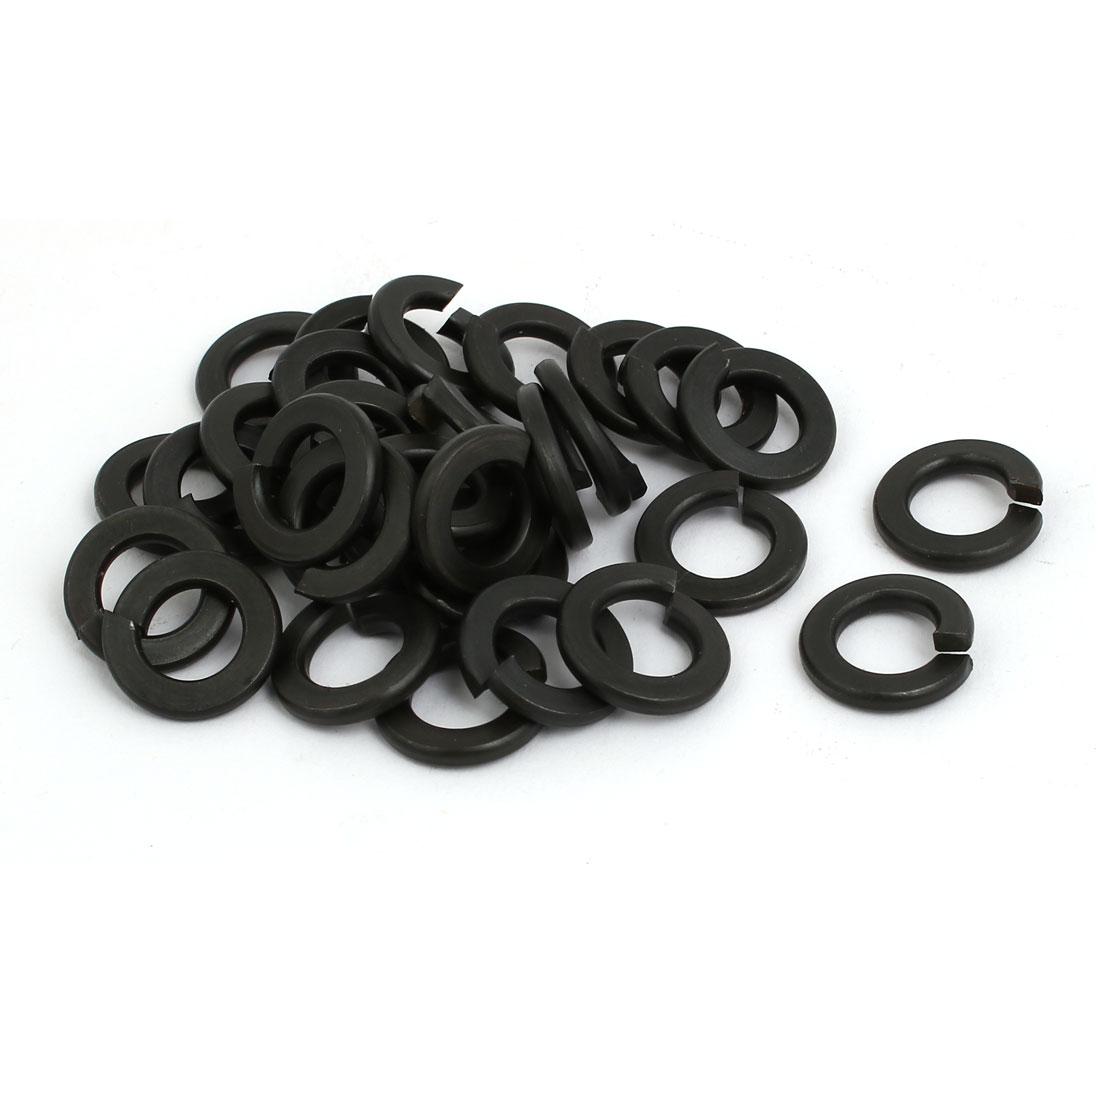 30pcs 3/8-inch Inner Dia Carbon Steel Split Lock Spring Washer Gasket Black